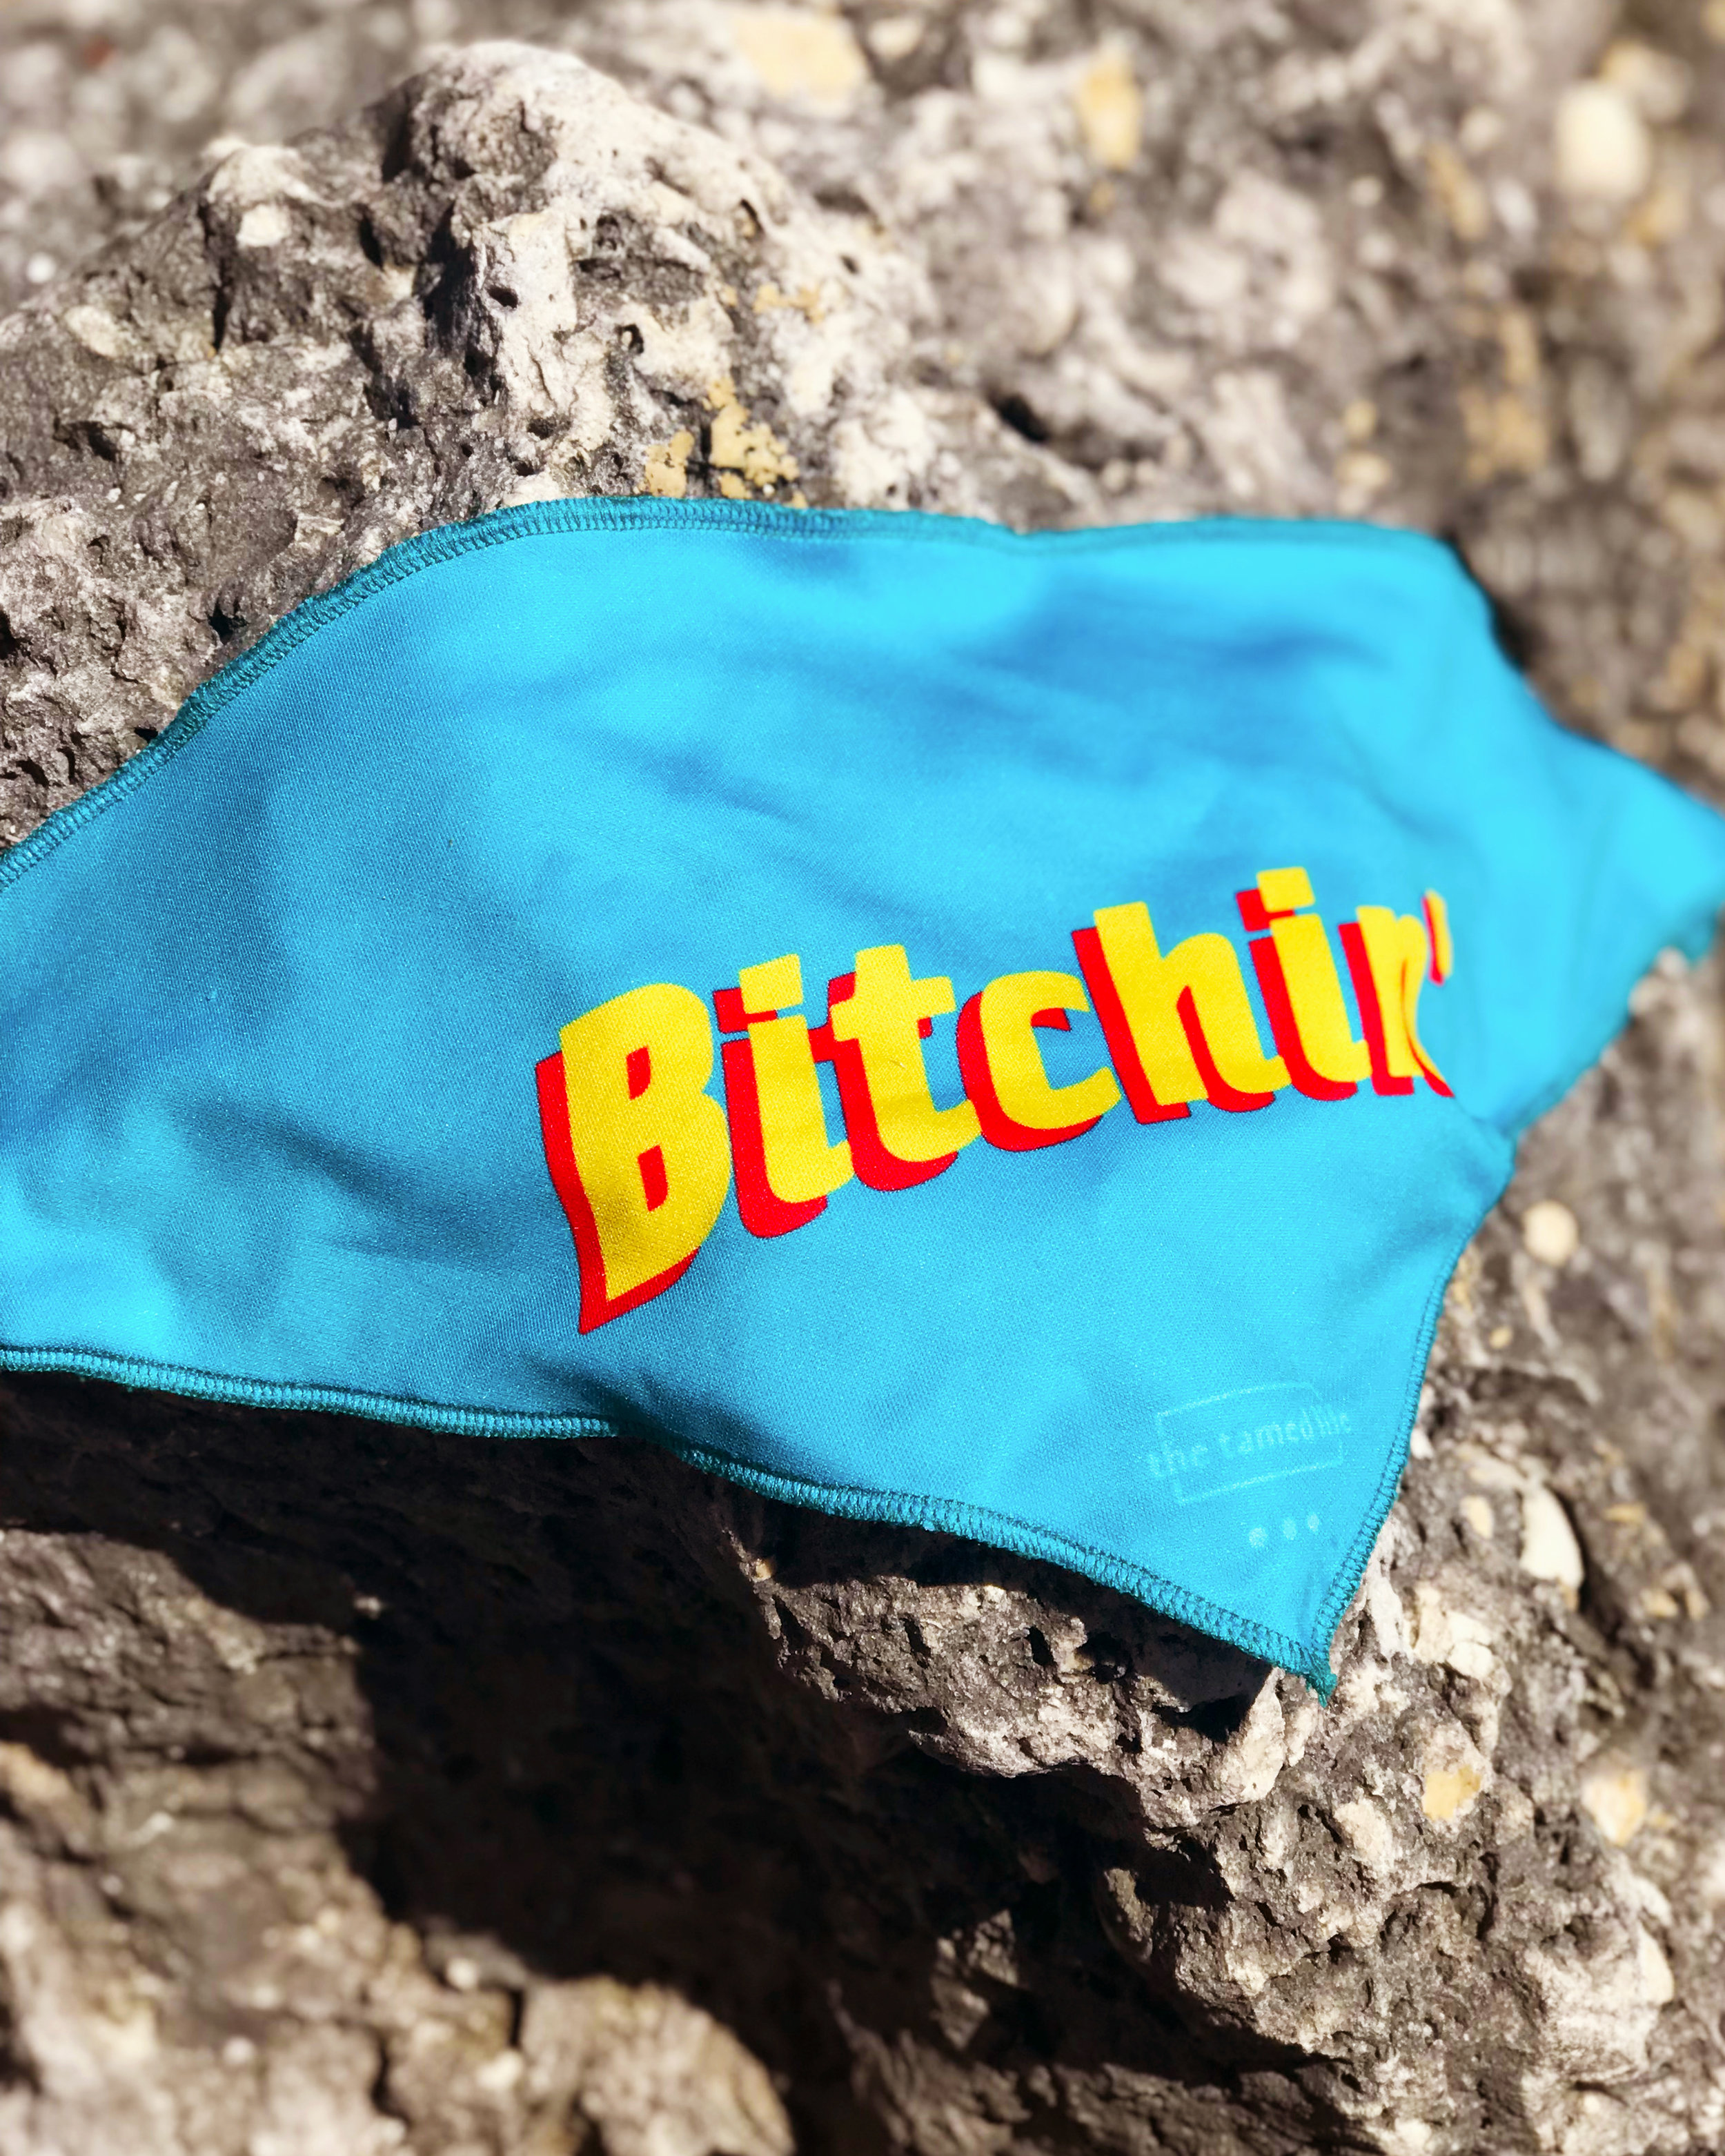 bitchin_rocks_1.jpg